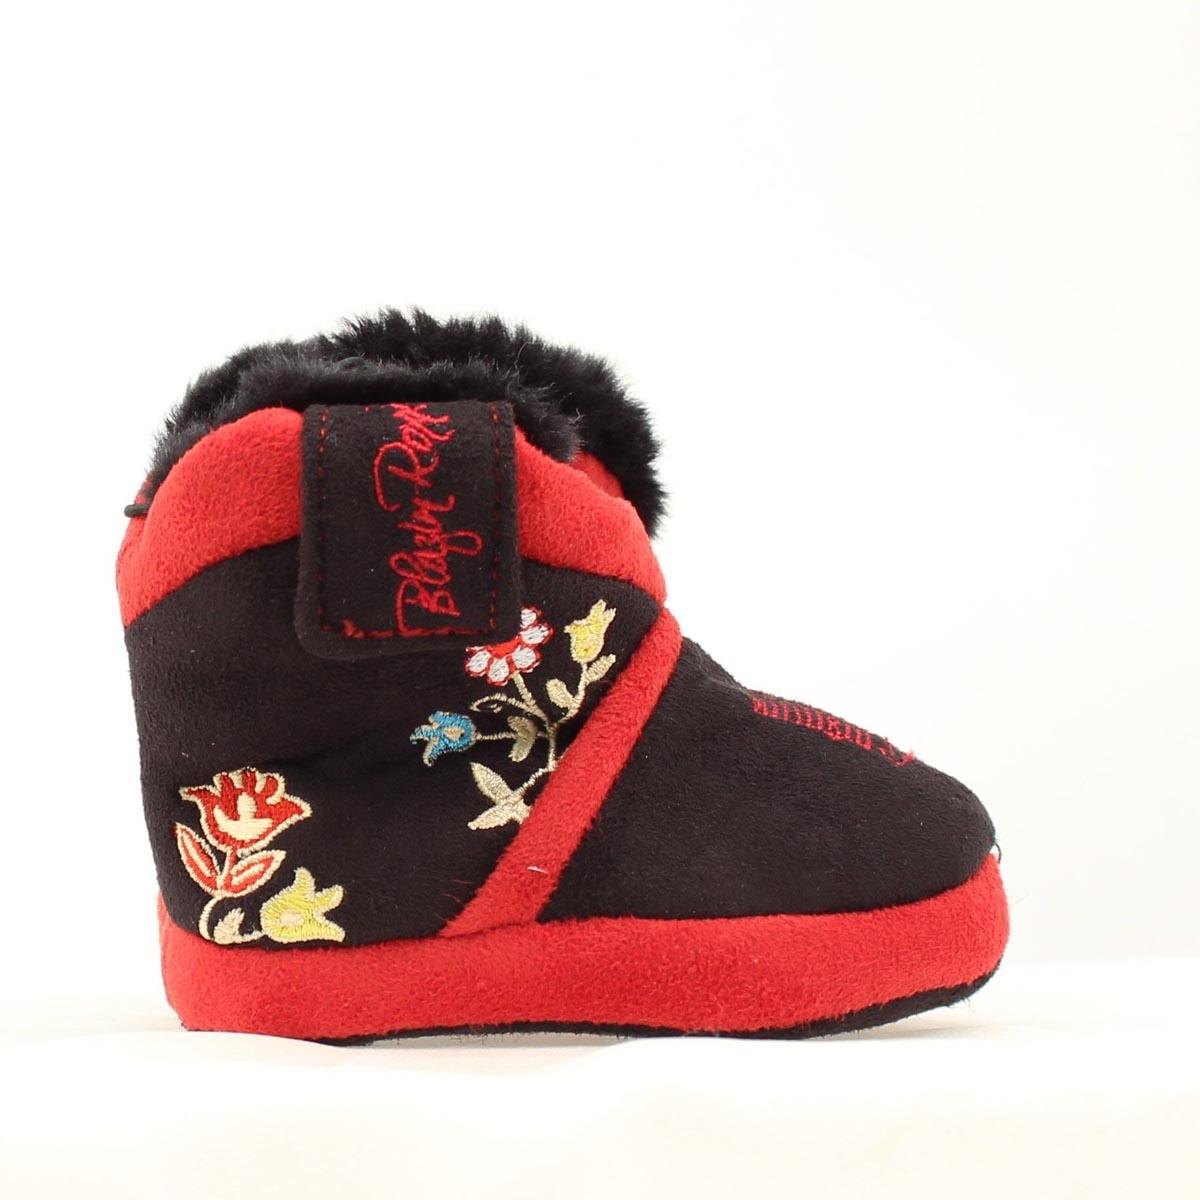 Blazin Roxx Infant Floral Embroidered Slipper